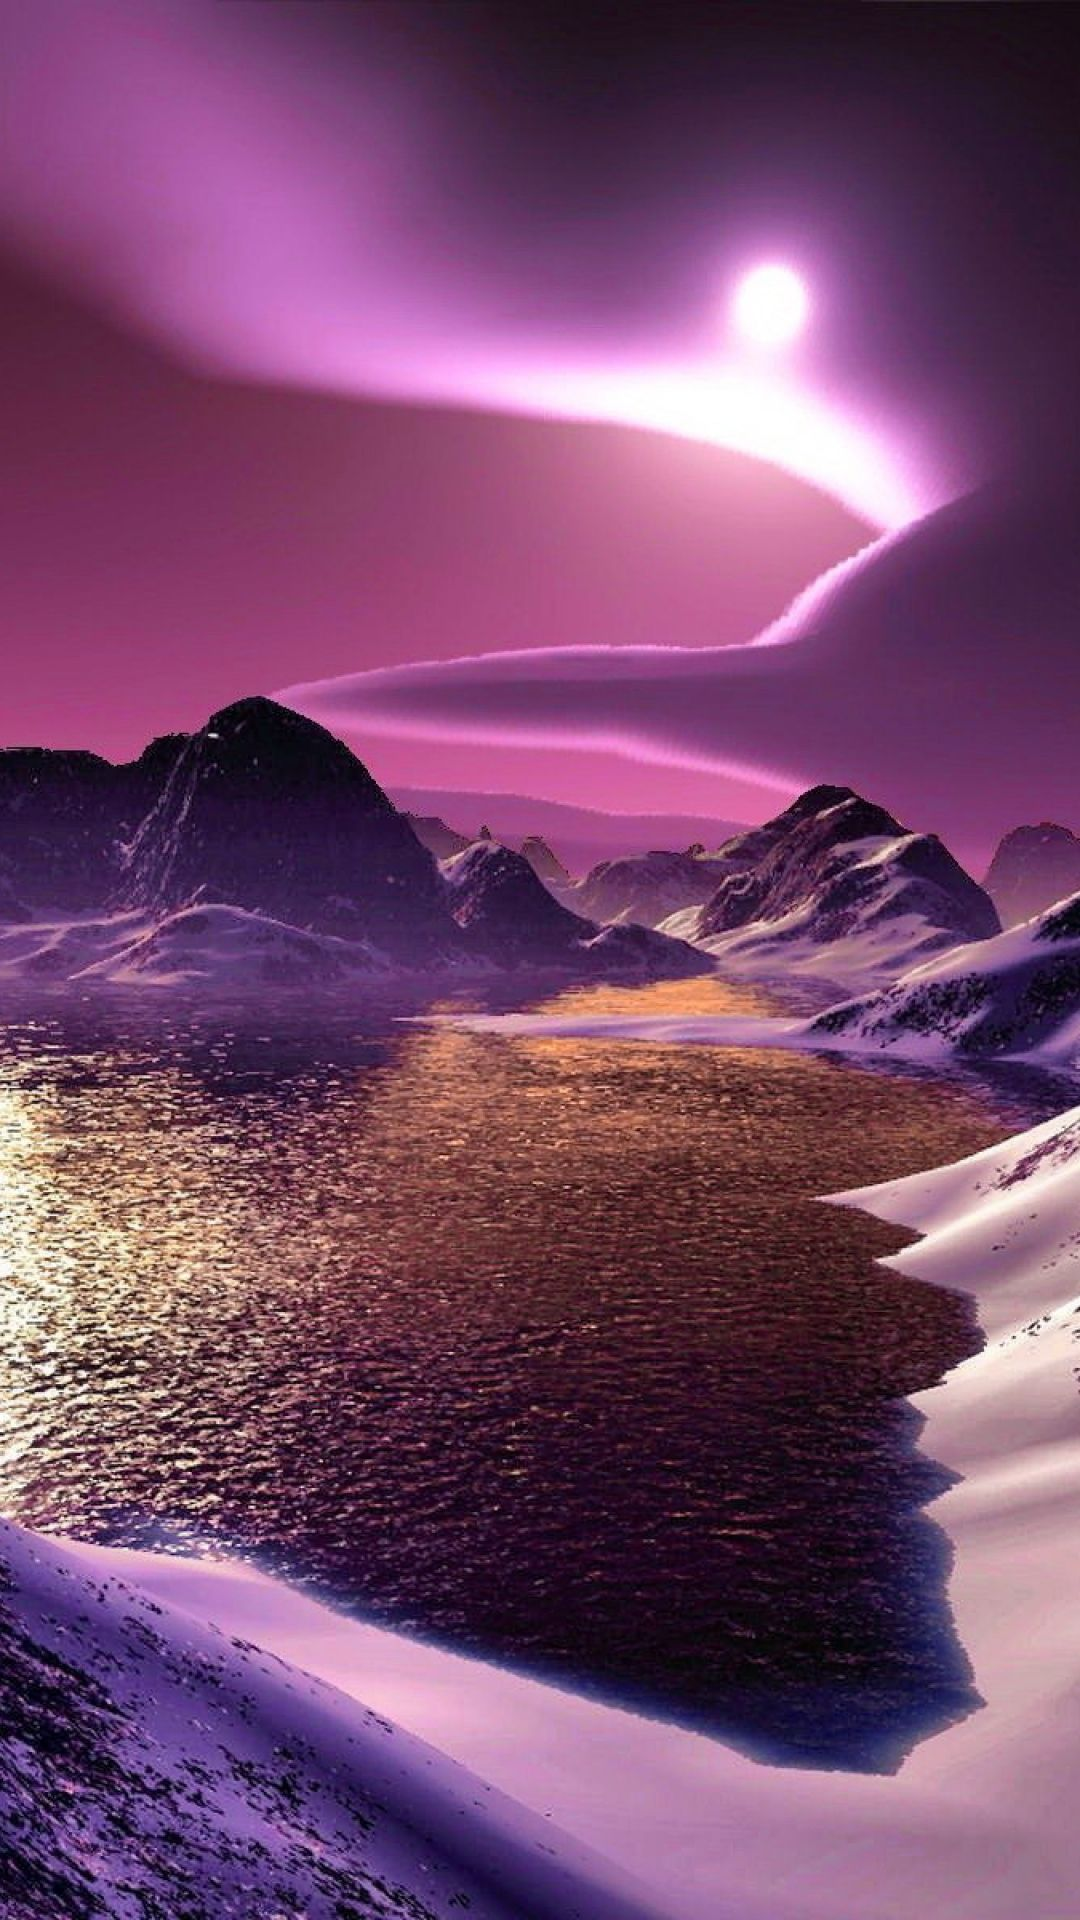 1080x1920 Wallpaper Mountains Lake Bottom Night Moon Light Clouds Graphics Beautiful Nature Beautiful Landscapes Nature Photography